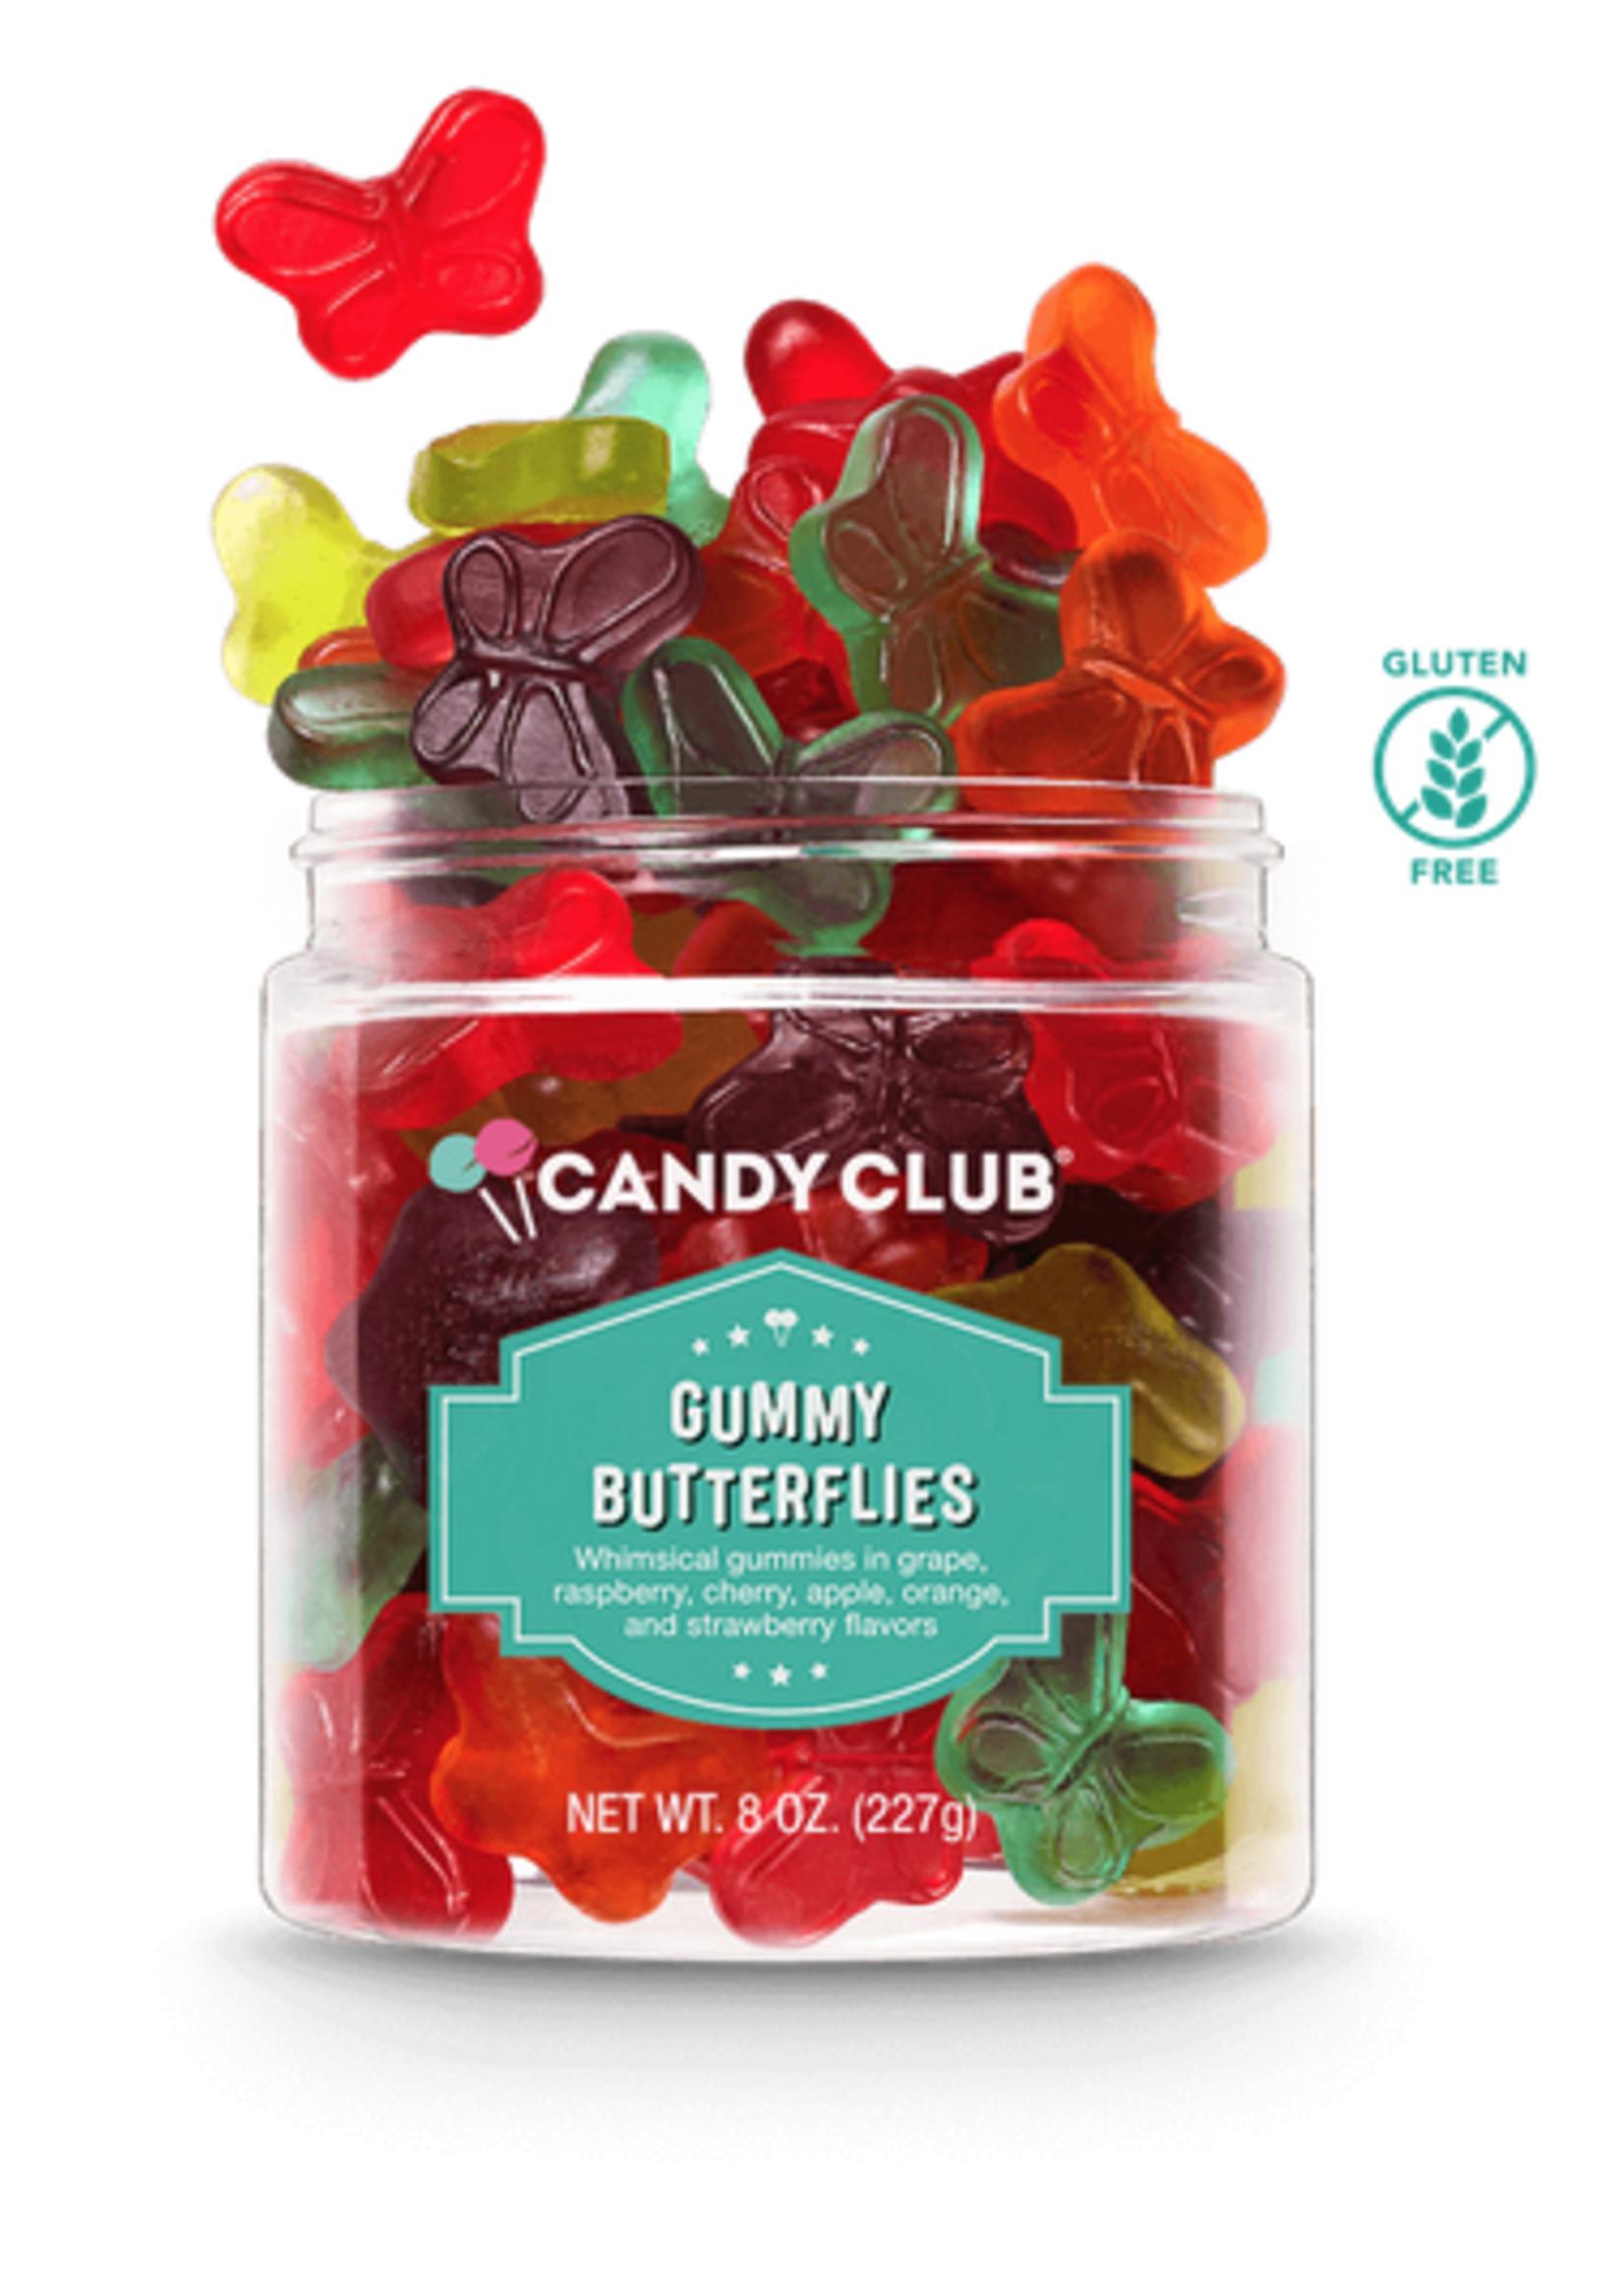 candy club candy club gummy butterflies